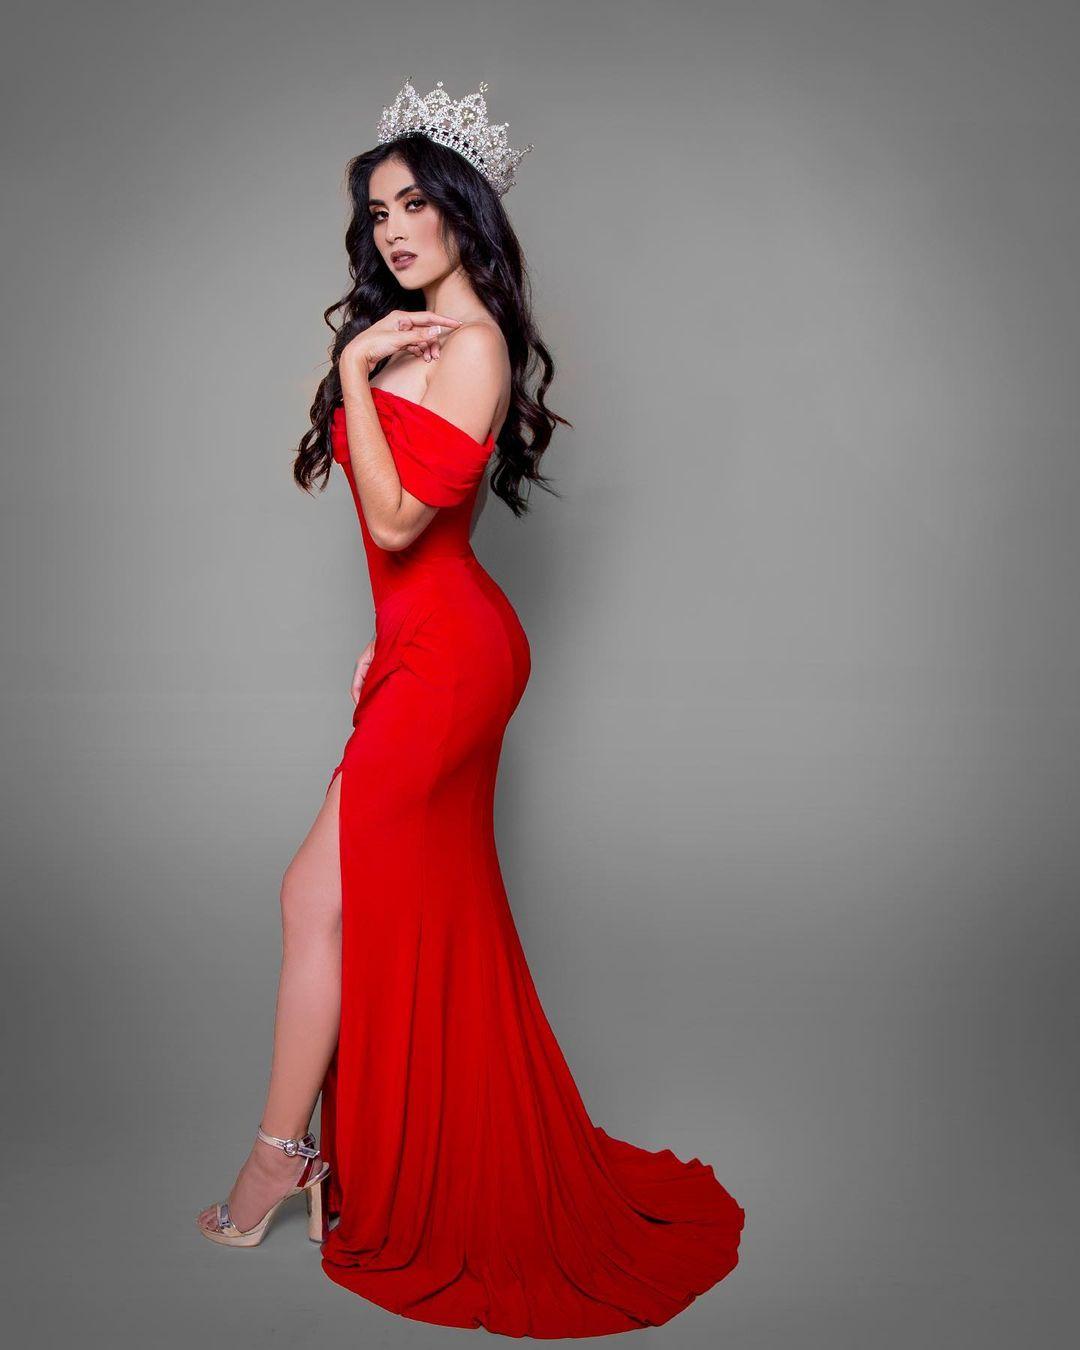 graciela ballesteros, miss earth mexico 2020/top 10 de miss polo international 2019. Gracie13